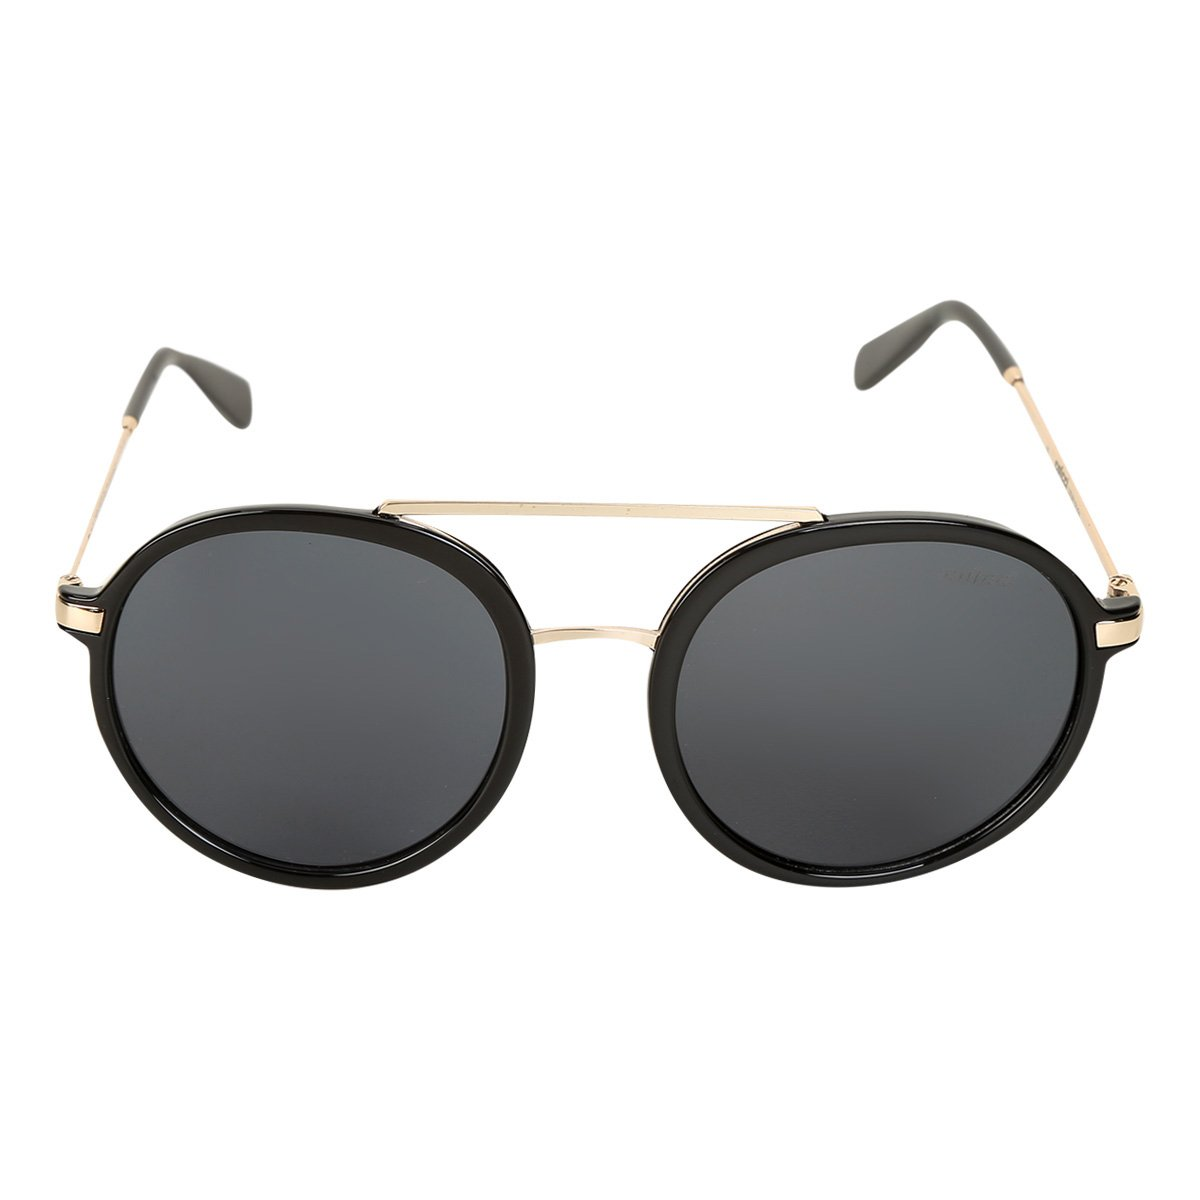 eb3755554f840 Óculos de Sol Colcci Redondo Cindy Brilho Feminino - Compre Agora ...